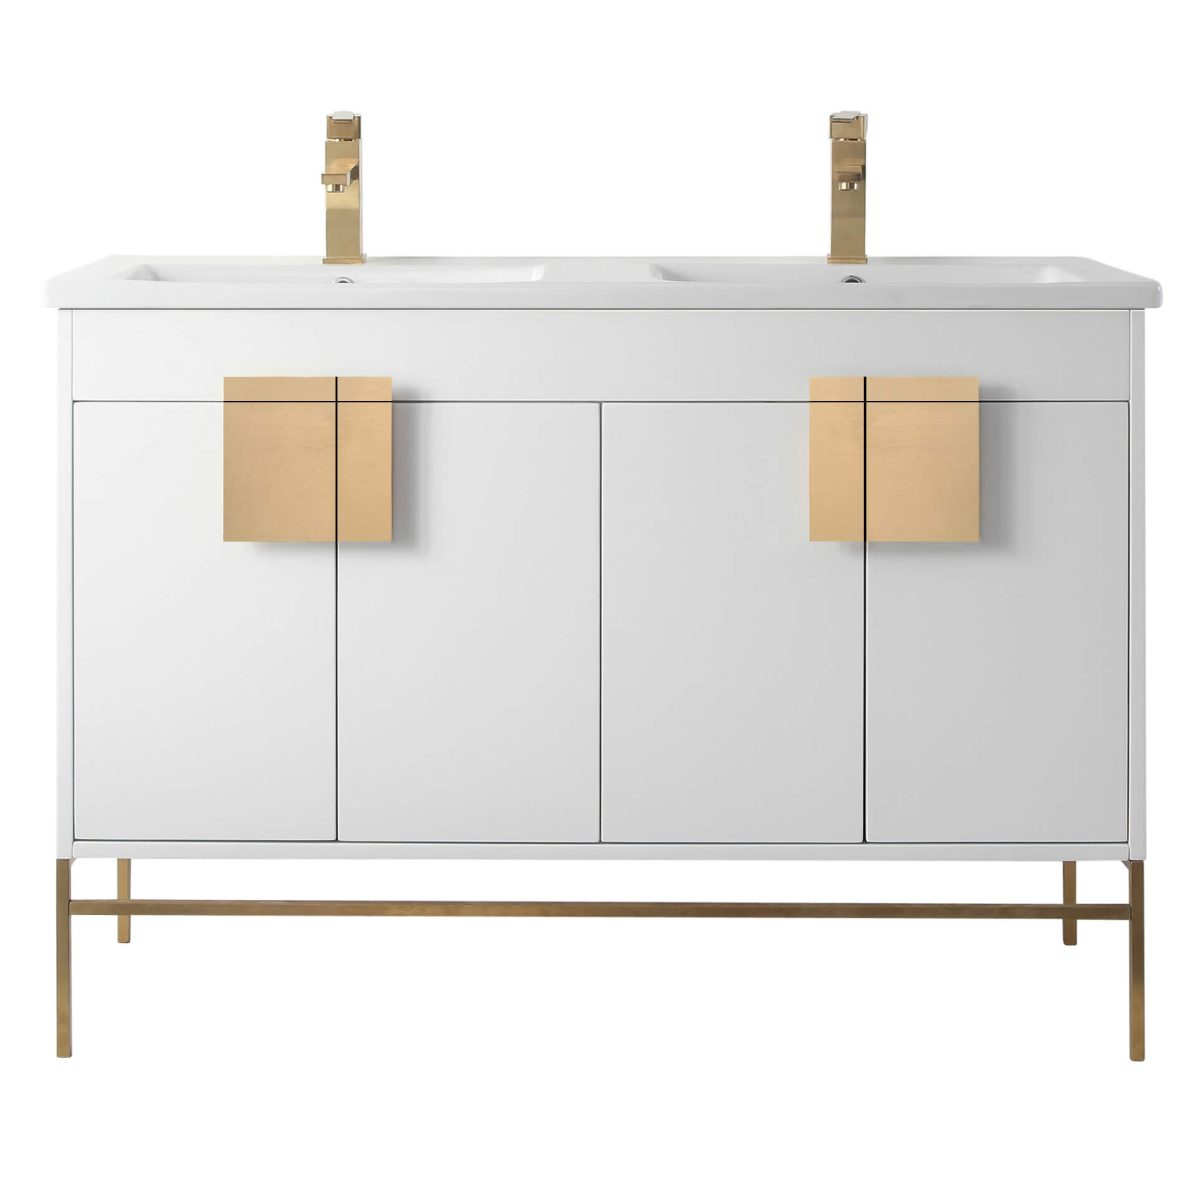 "Shawbridge 48"" Modern Double Bathroom Vanity  White with Satin Brass Hardware"